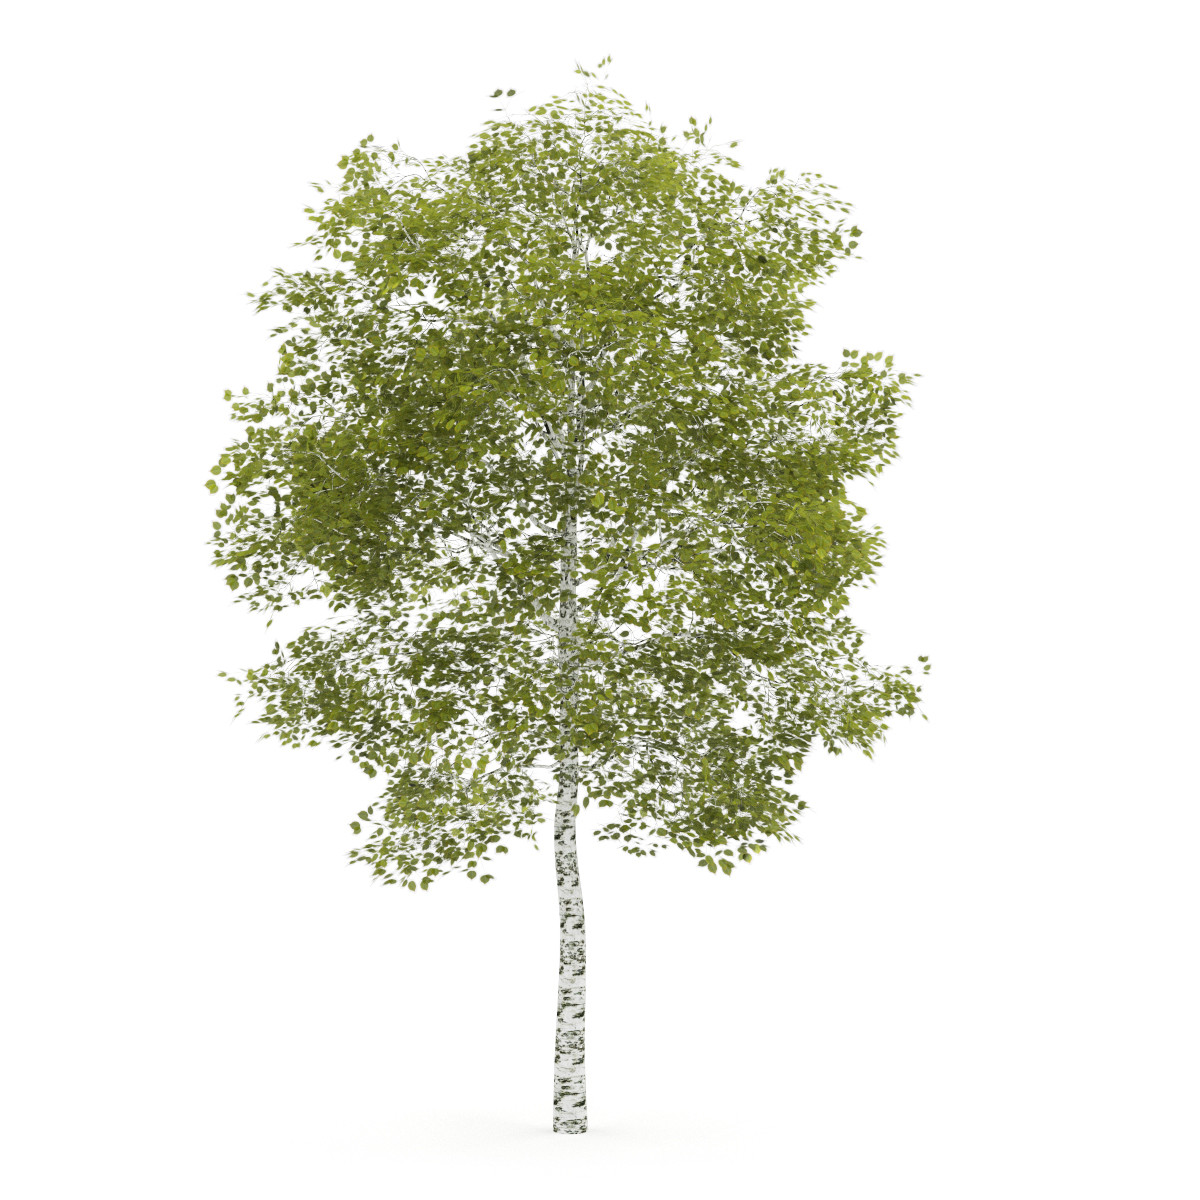 Birch-Tree 4.5m - CGAxis 3D Models.